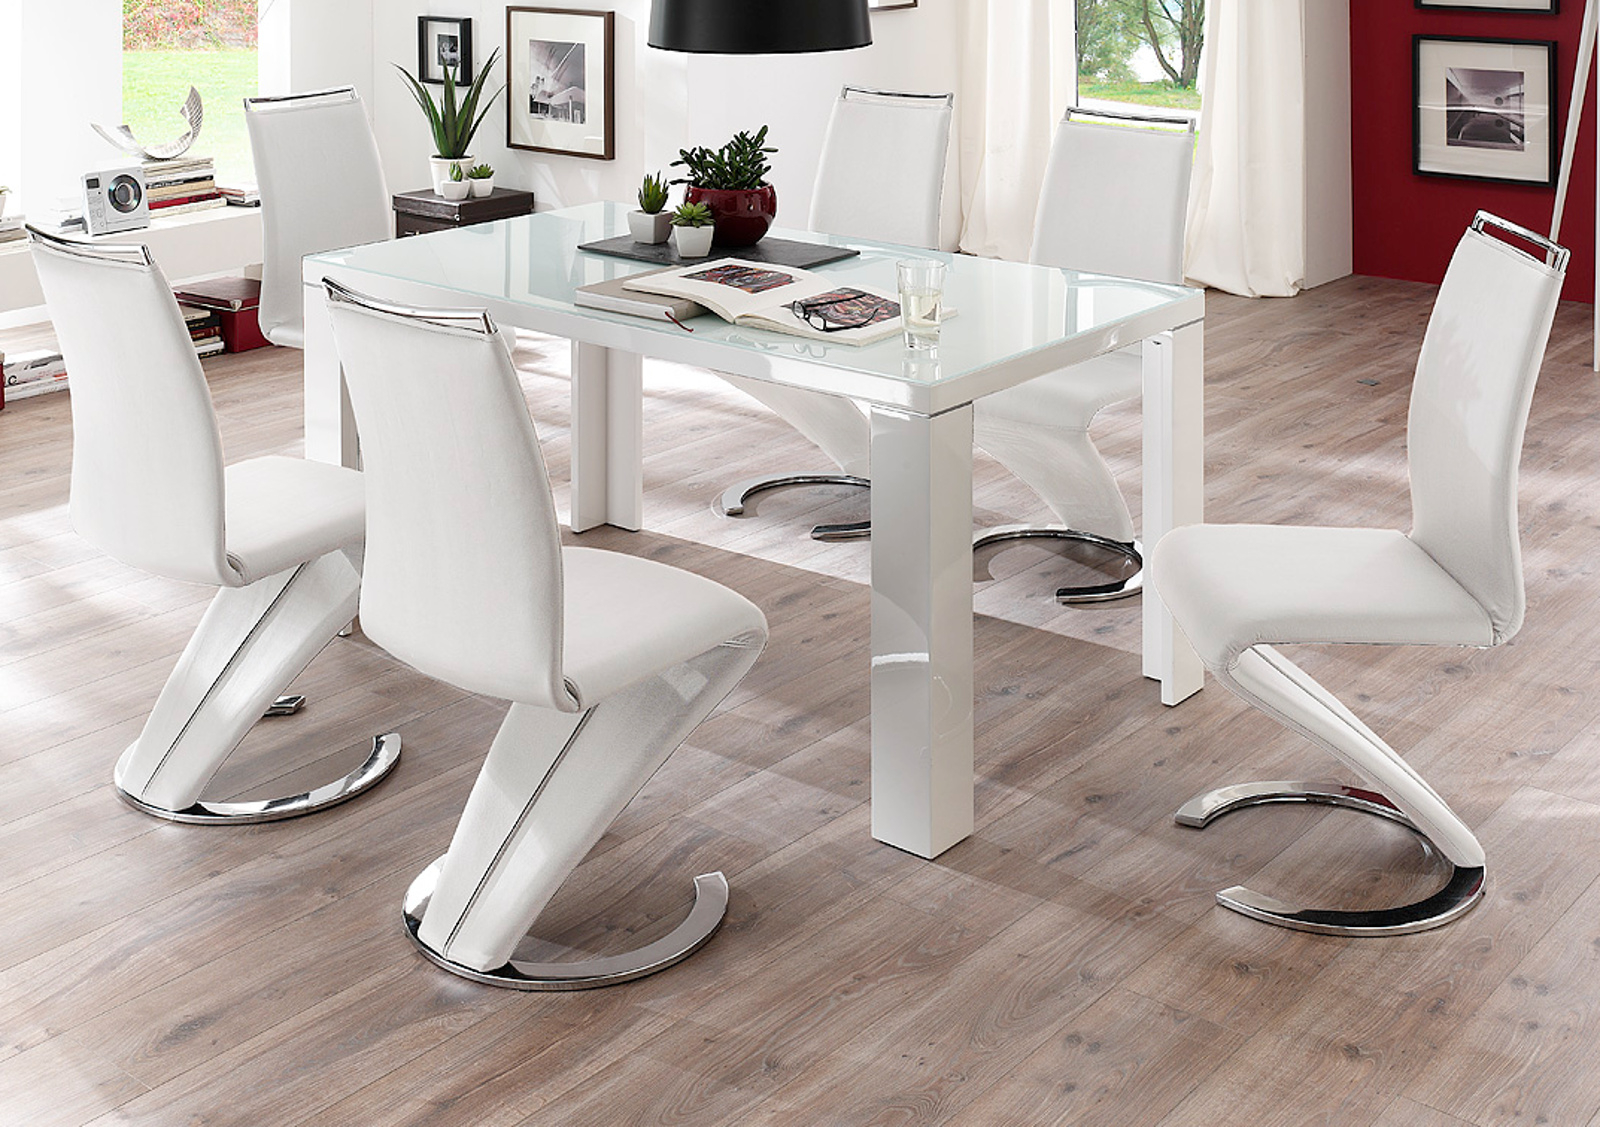 moderne b rom bel g nstig neuesten design kollektionen f r die familien. Black Bedroom Furniture Sets. Home Design Ideas